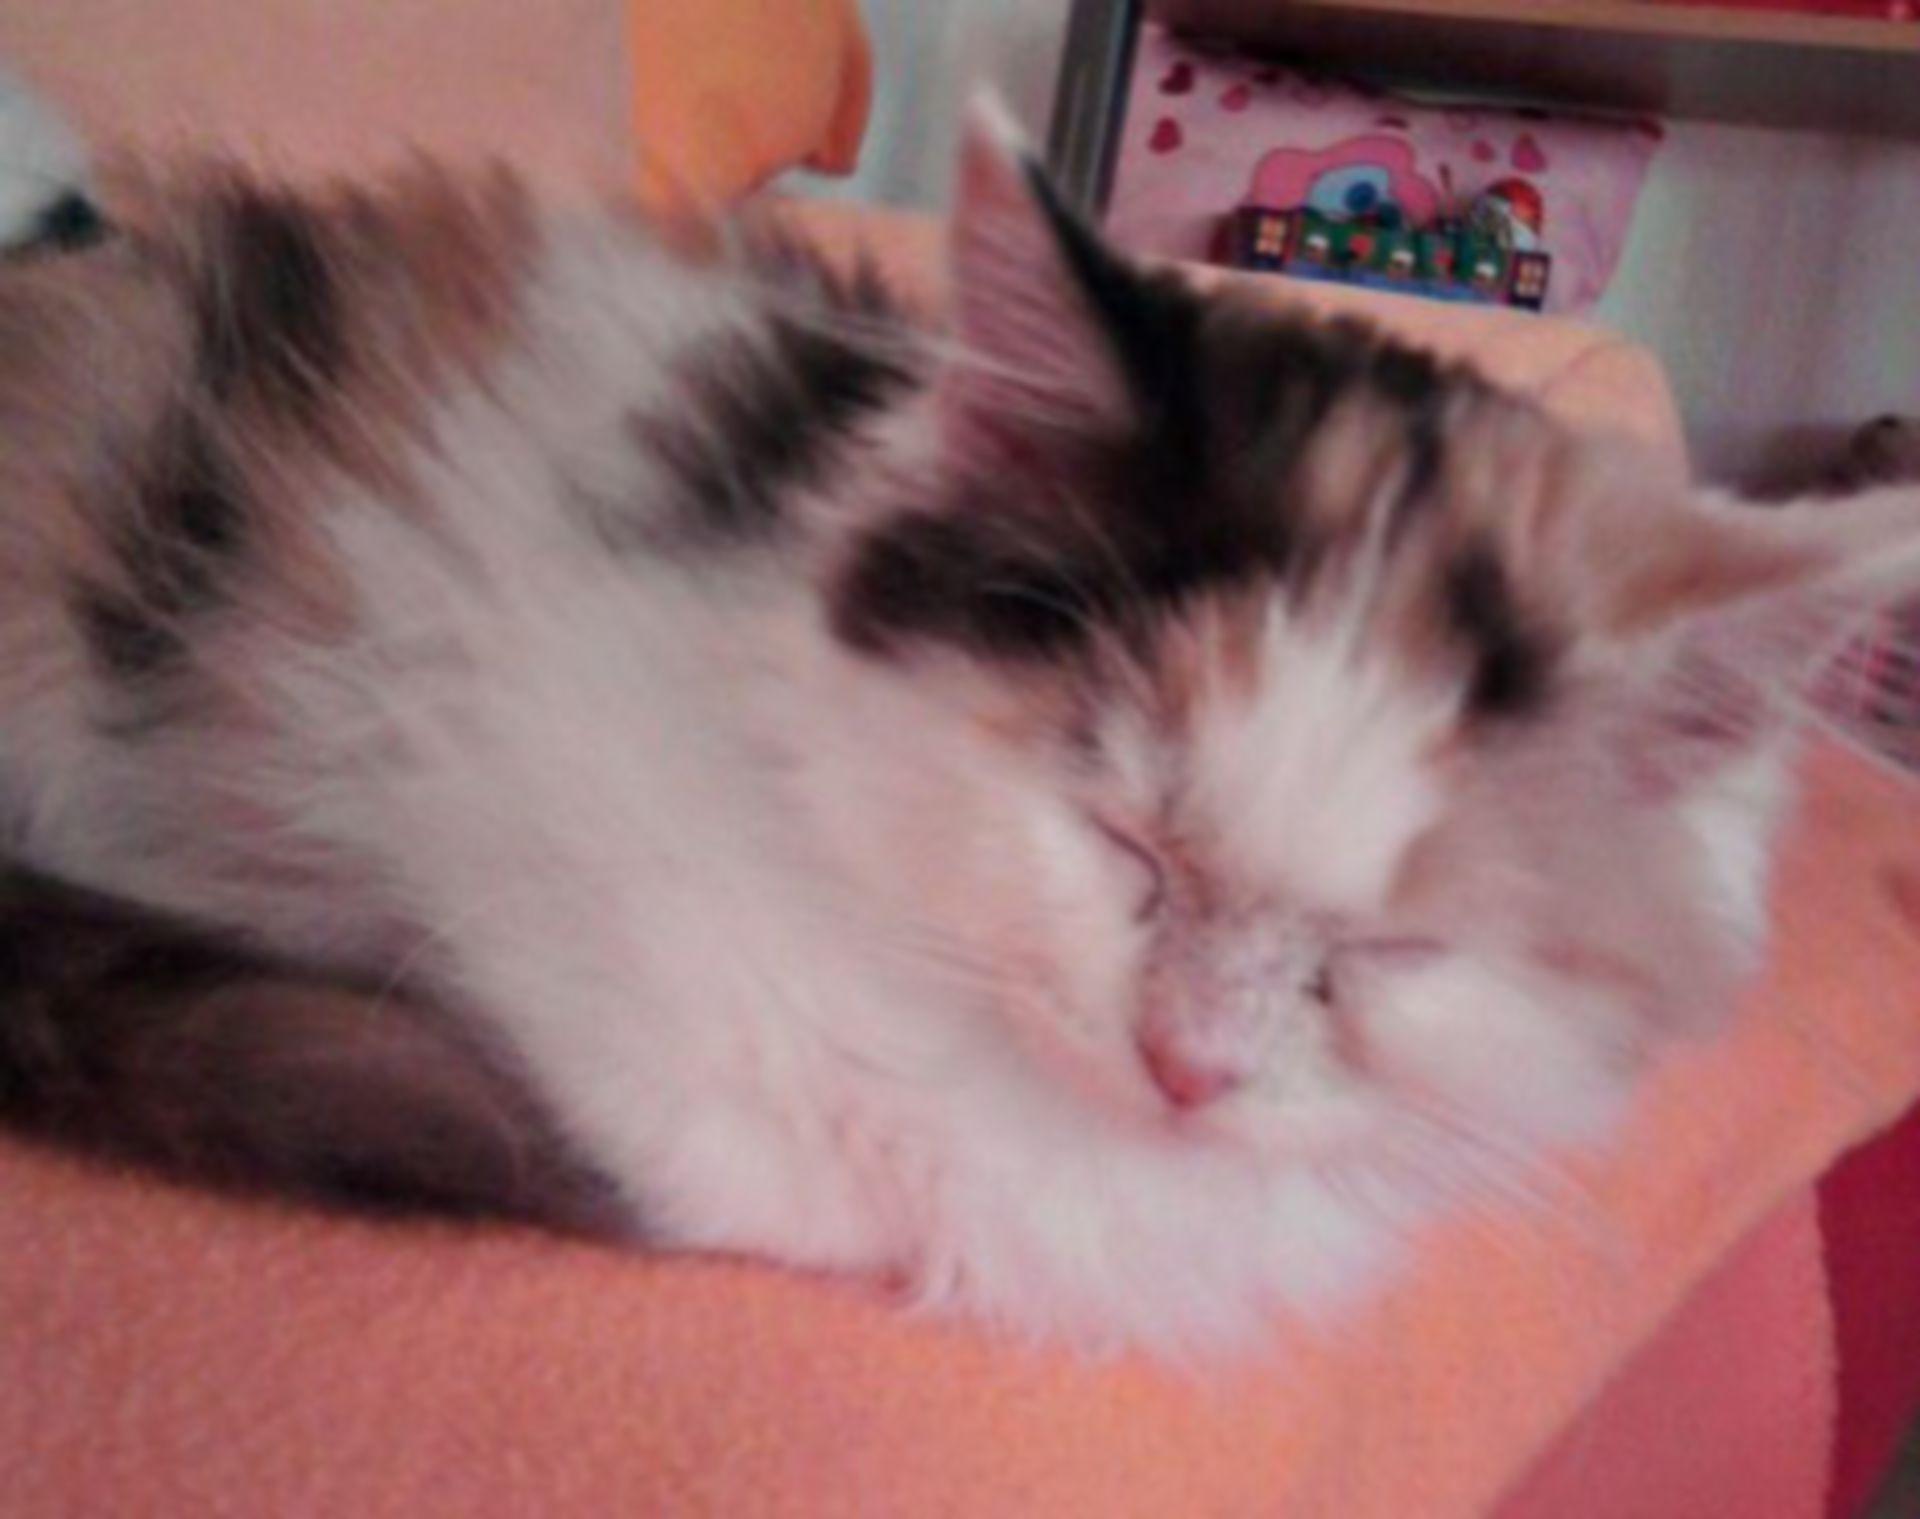 Perser hybrid -  3 months old